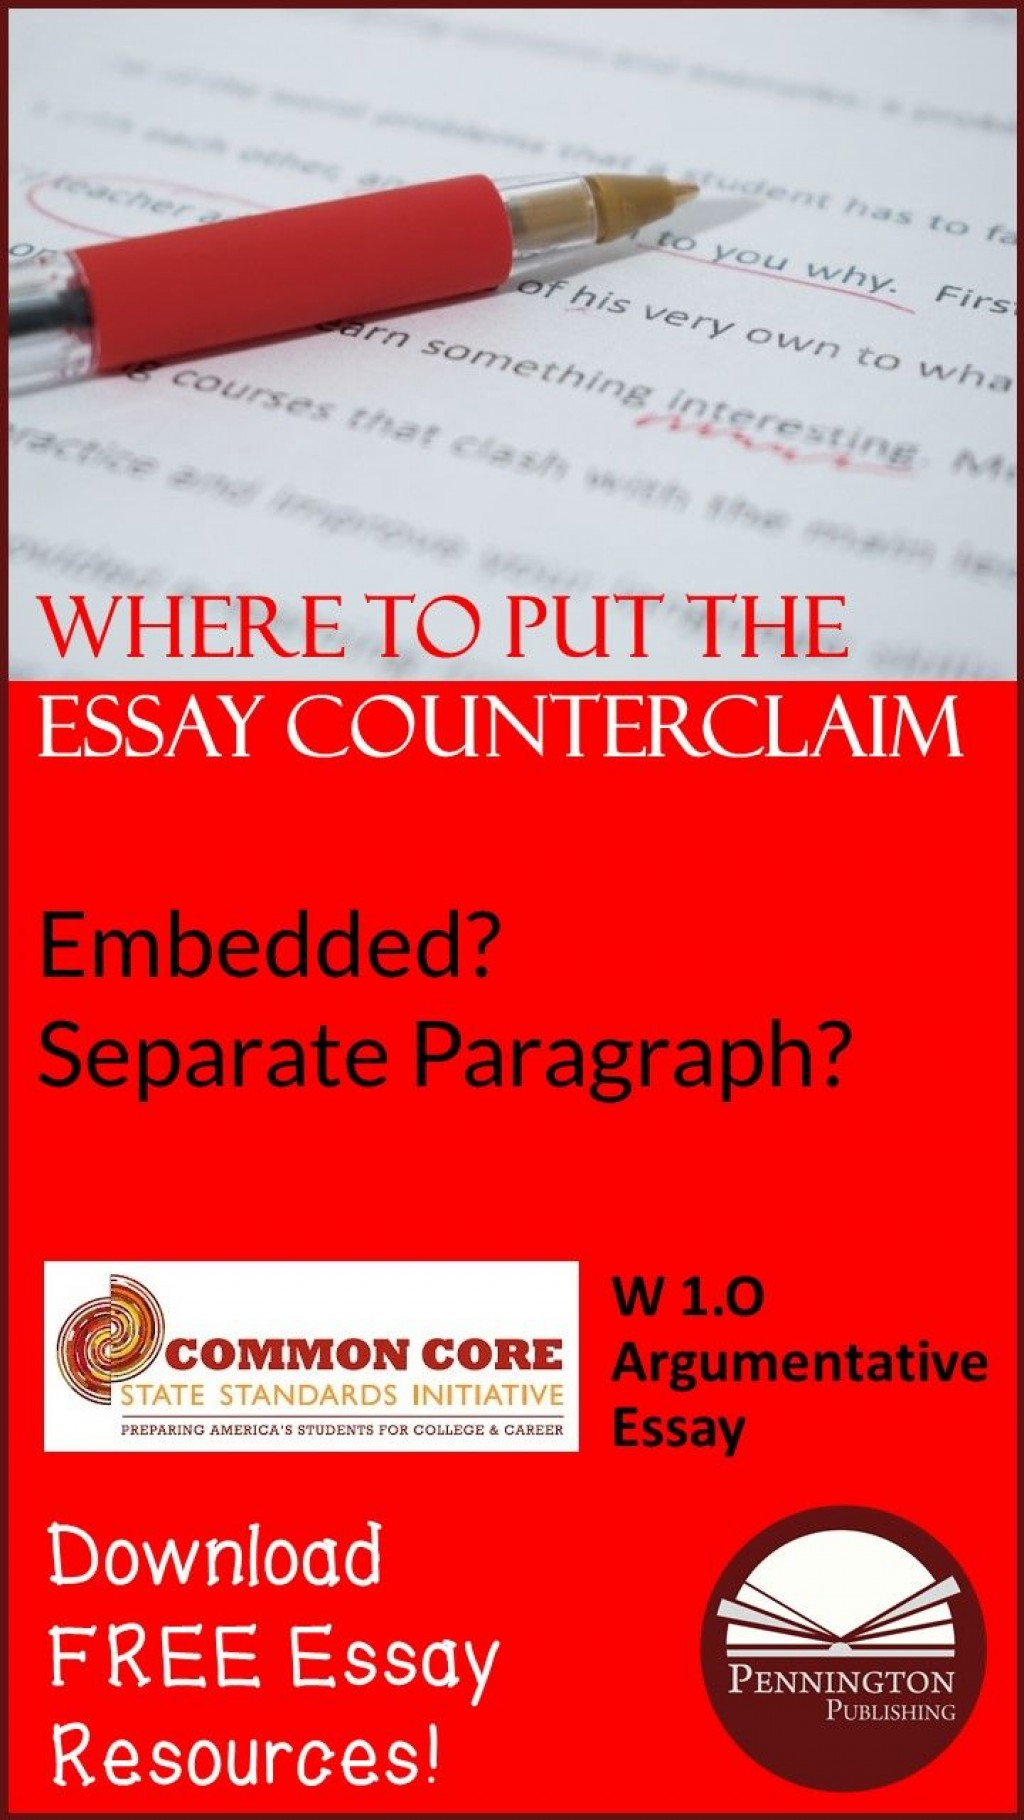 025 argumentative essay counterclaim example